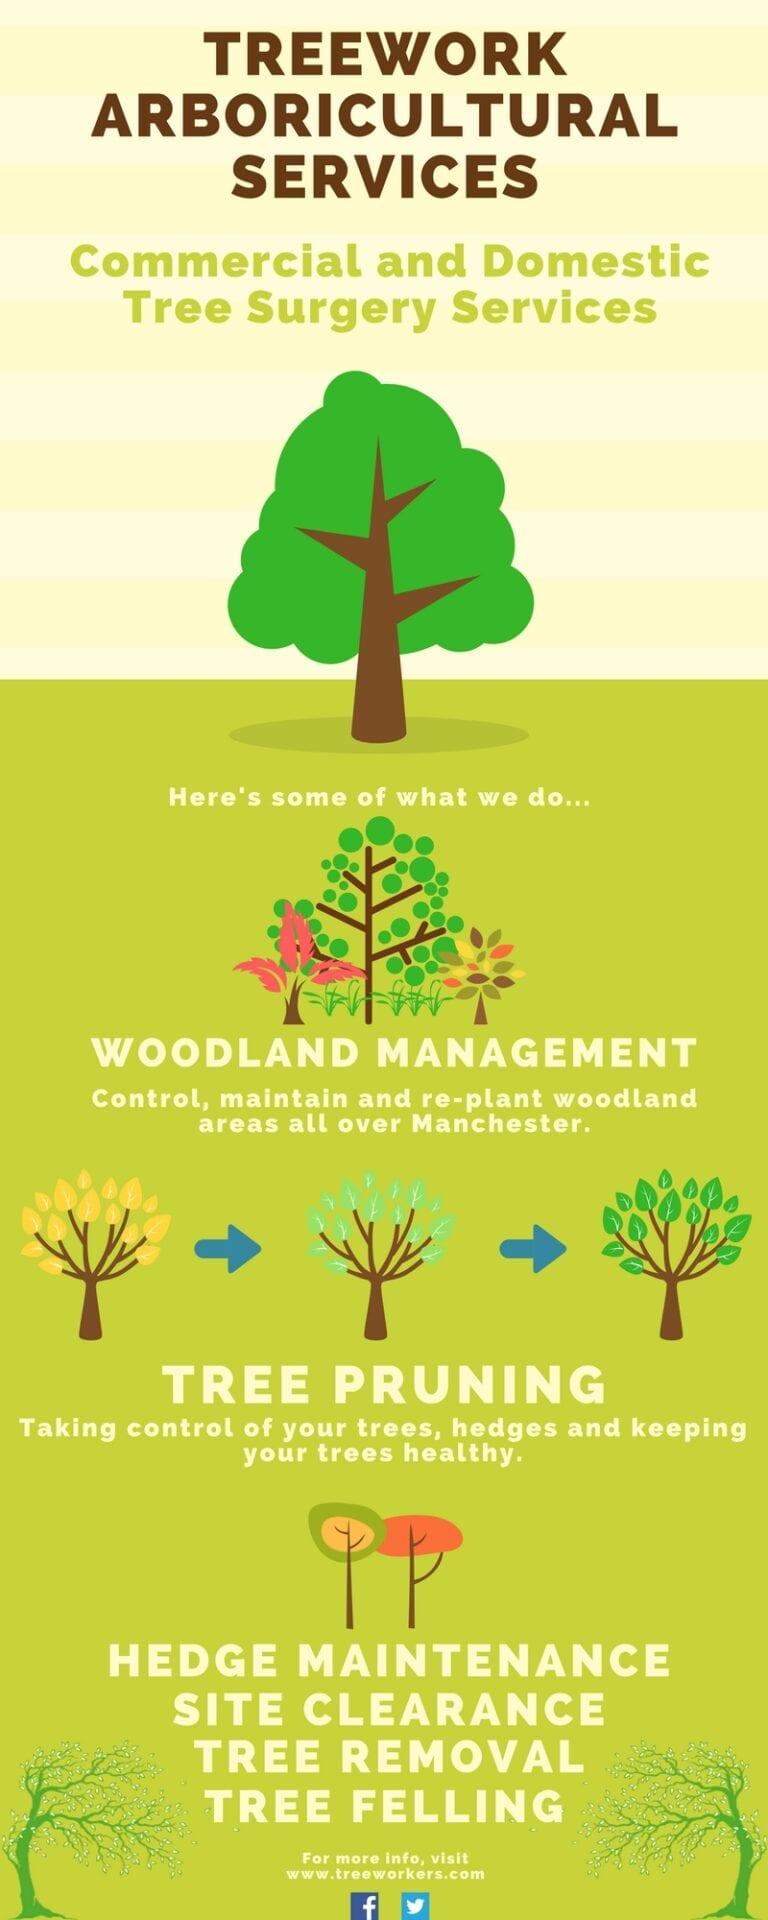 Treework Arboricultural Services